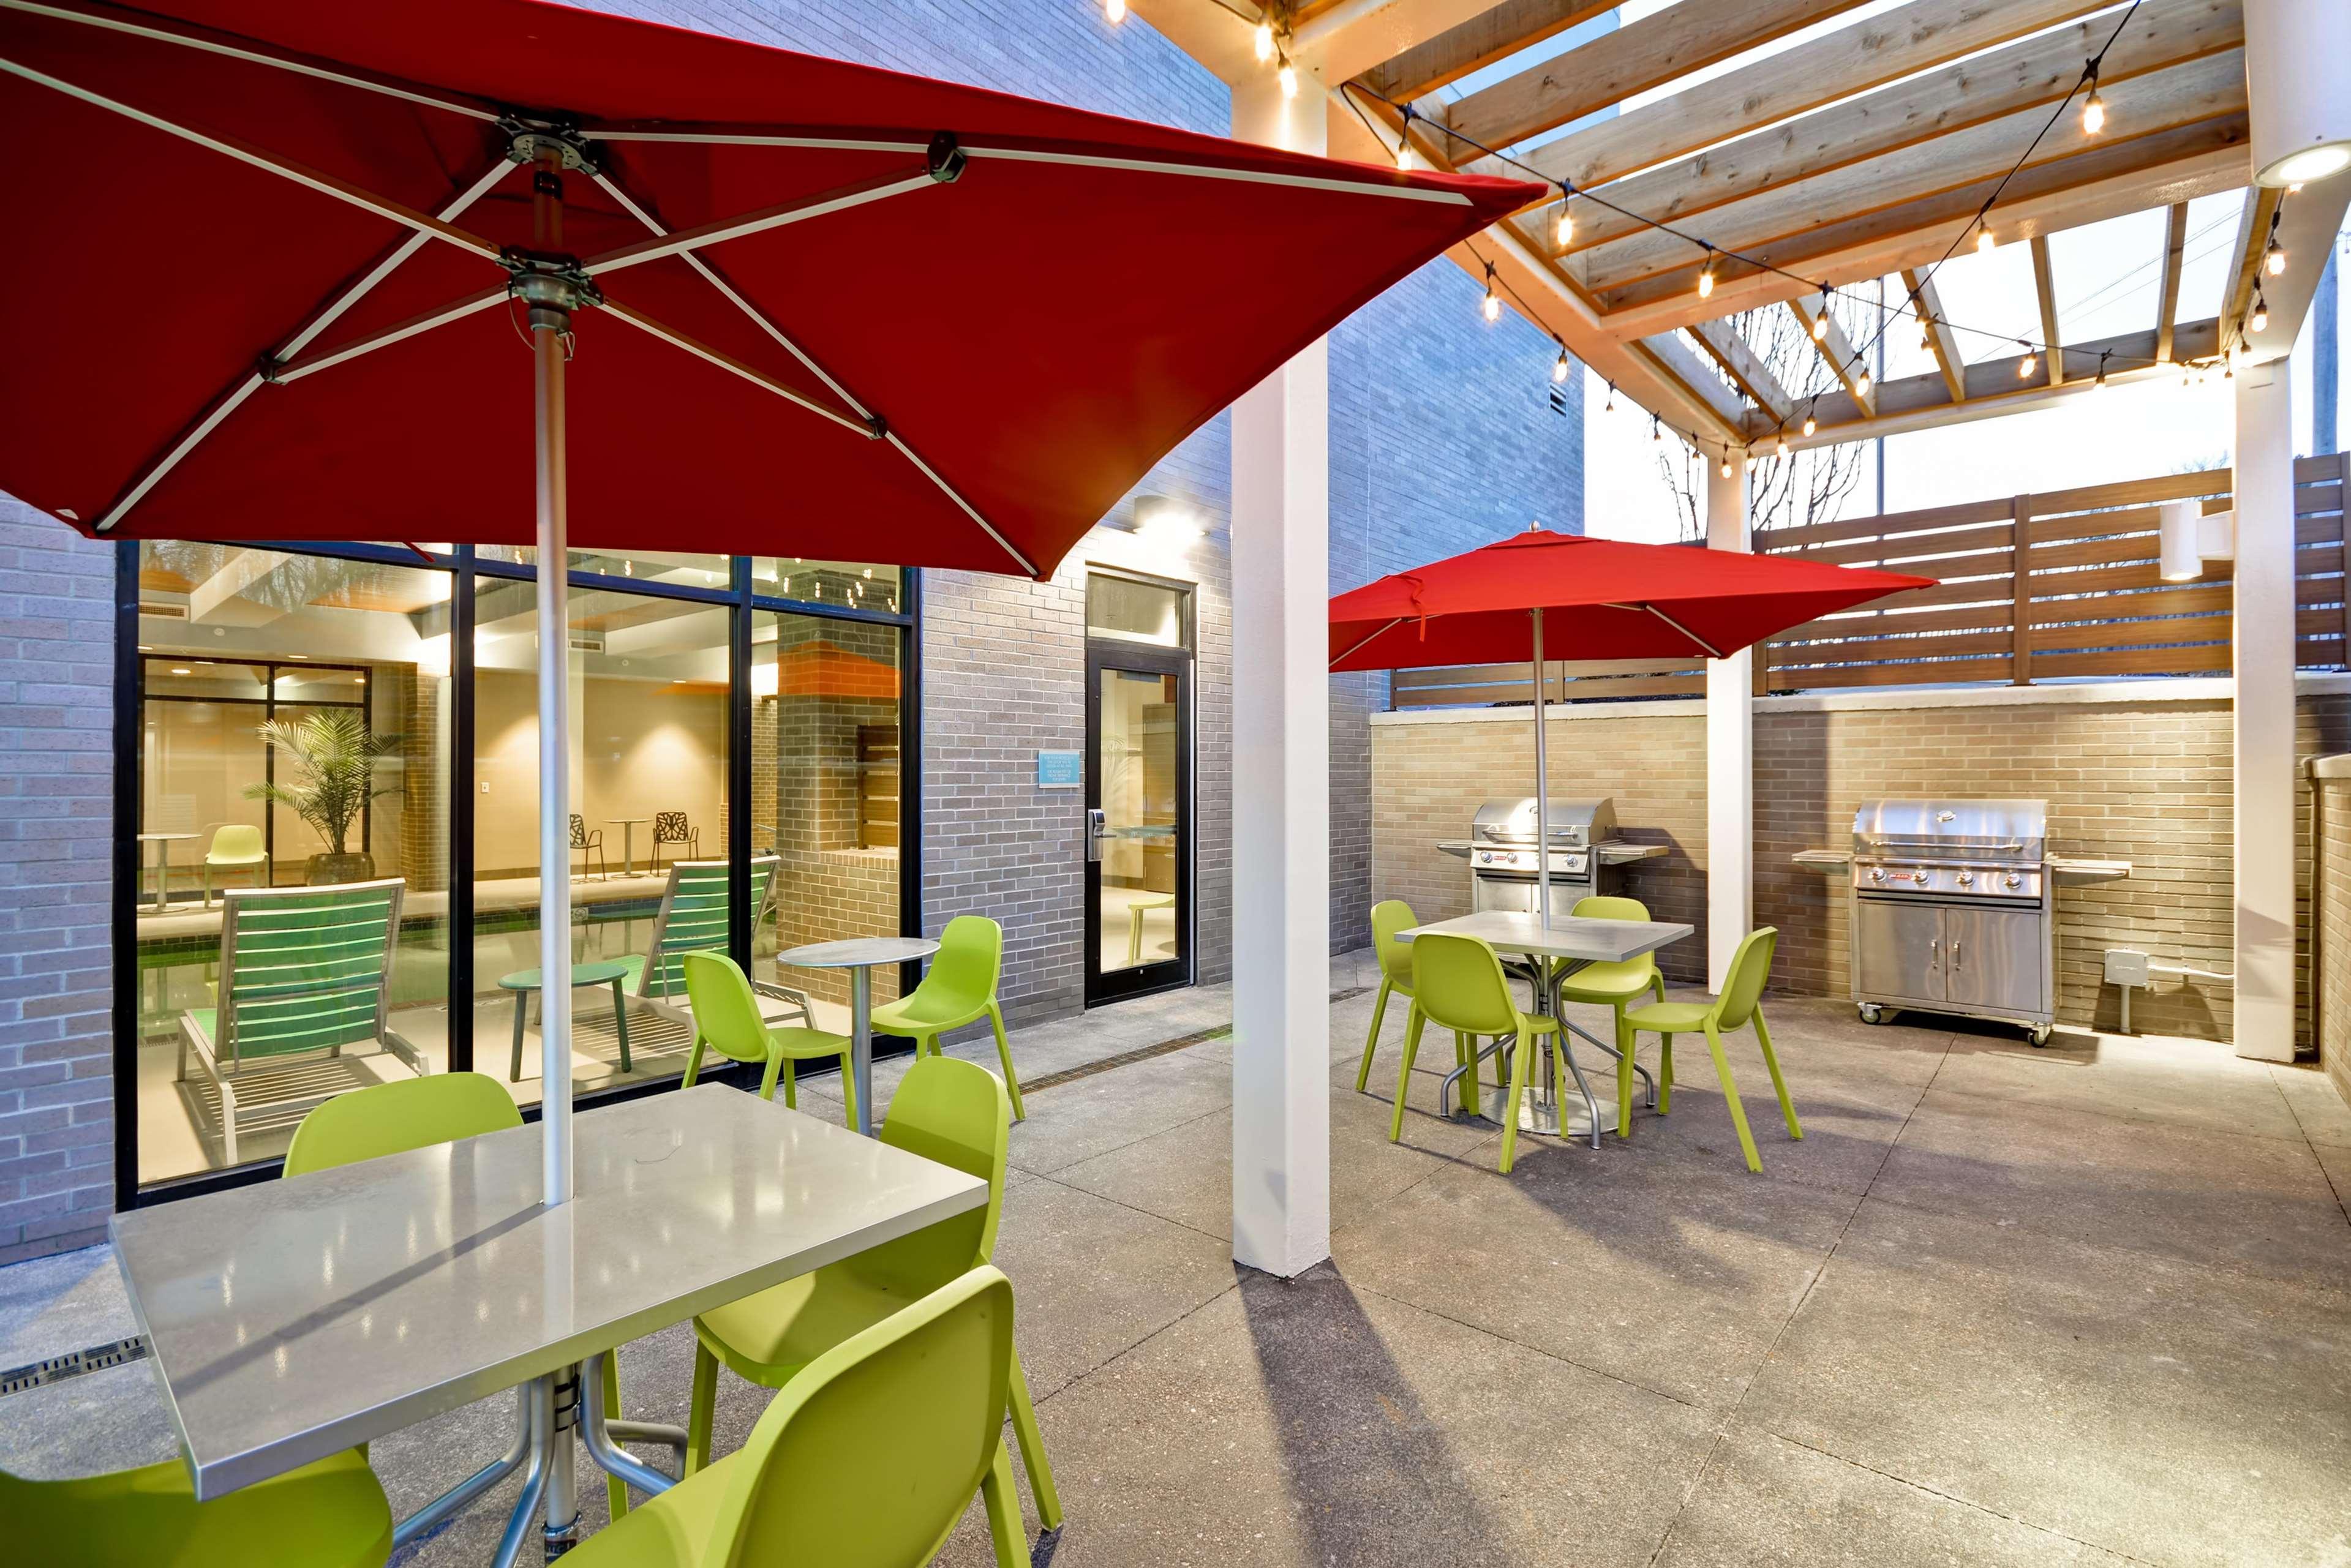 Home2 Suites by Hilton Kansas City KU Medical Center in